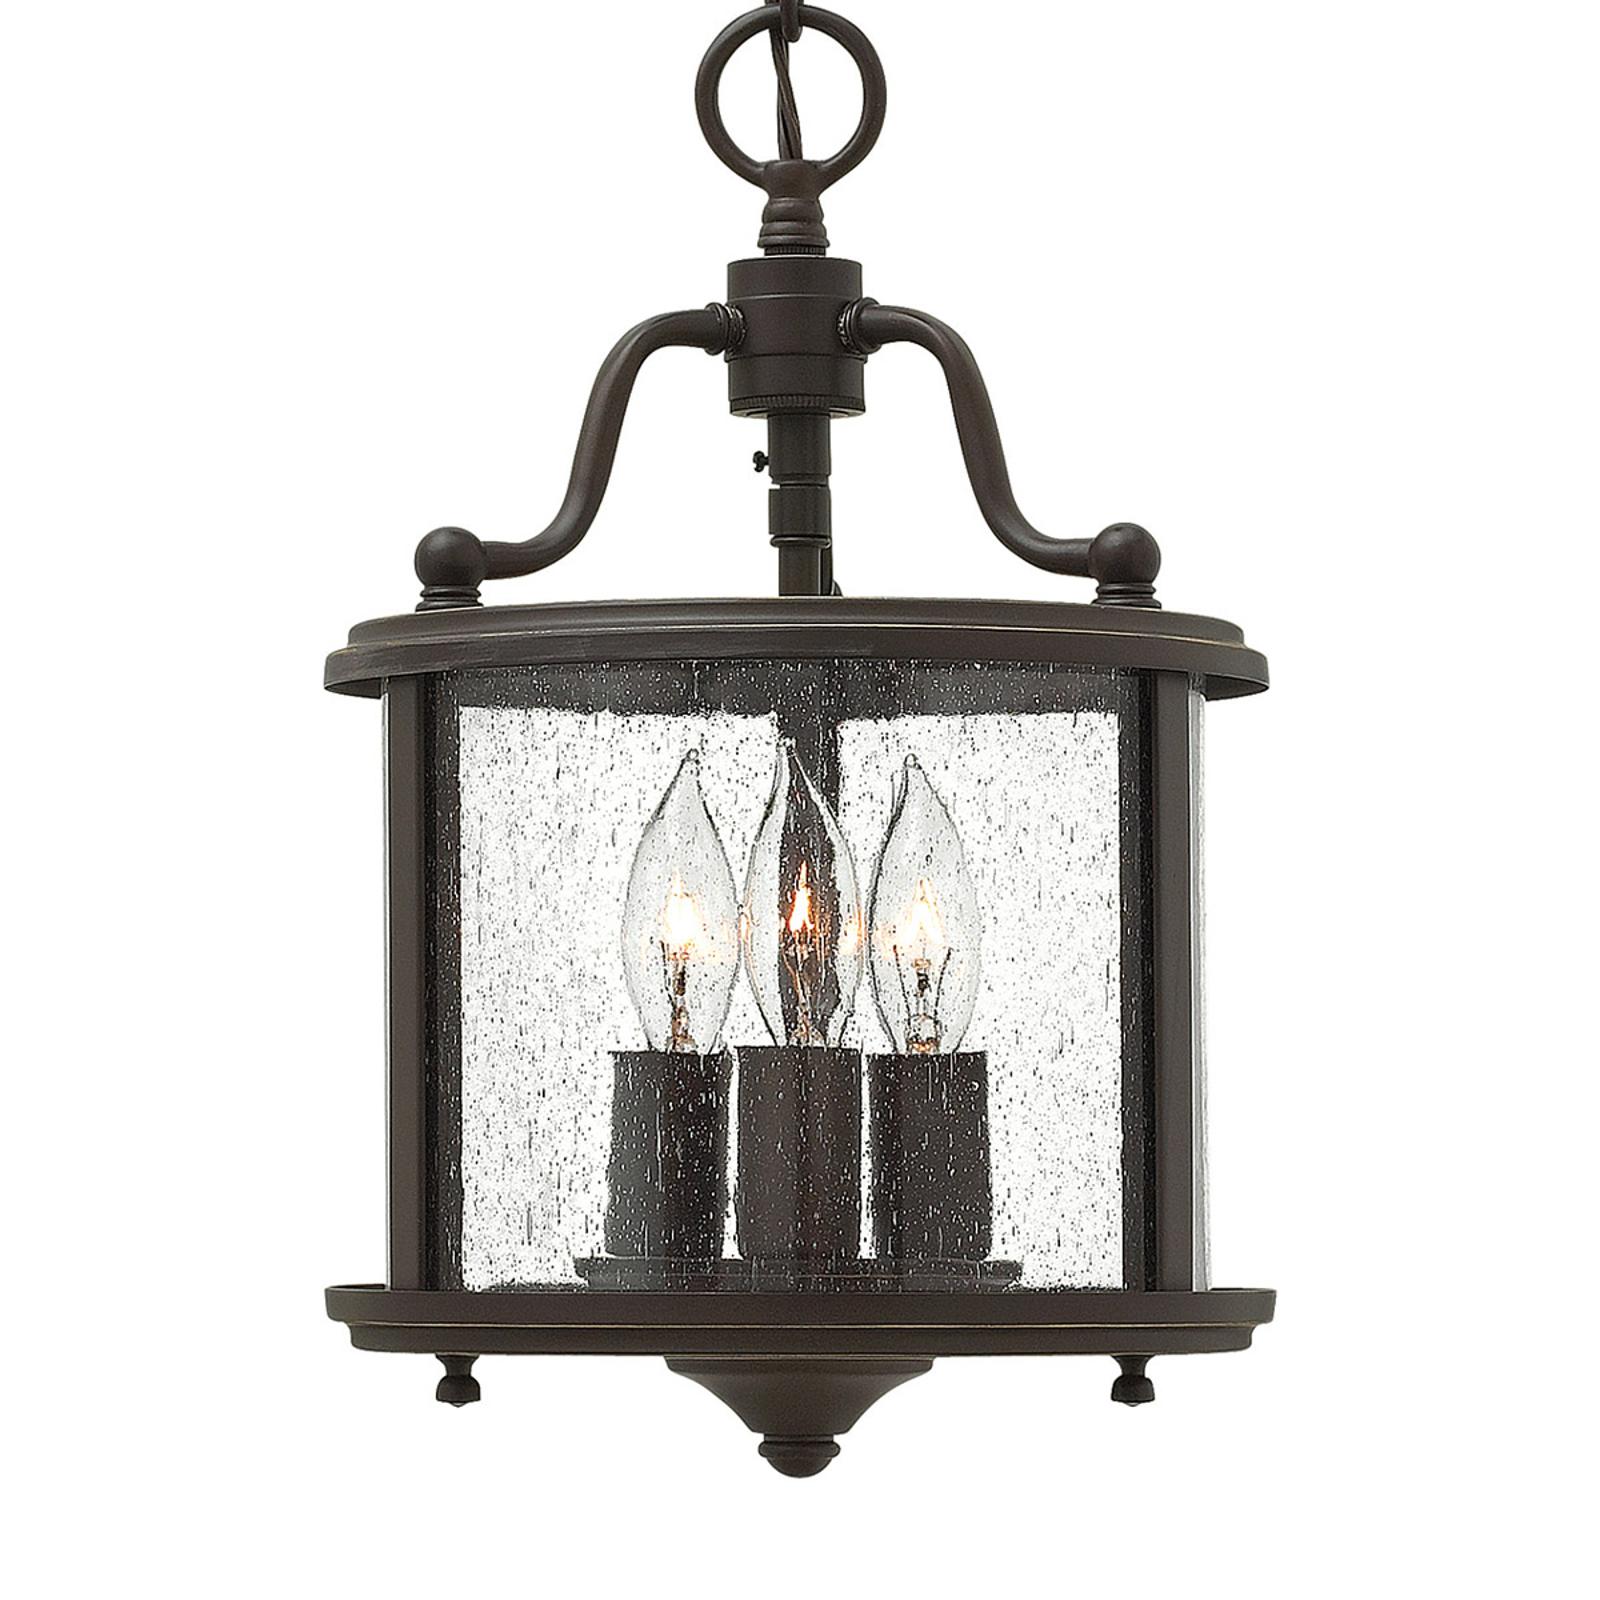 Anticky navrhnutá závesná lampa Gentry_3048315_1